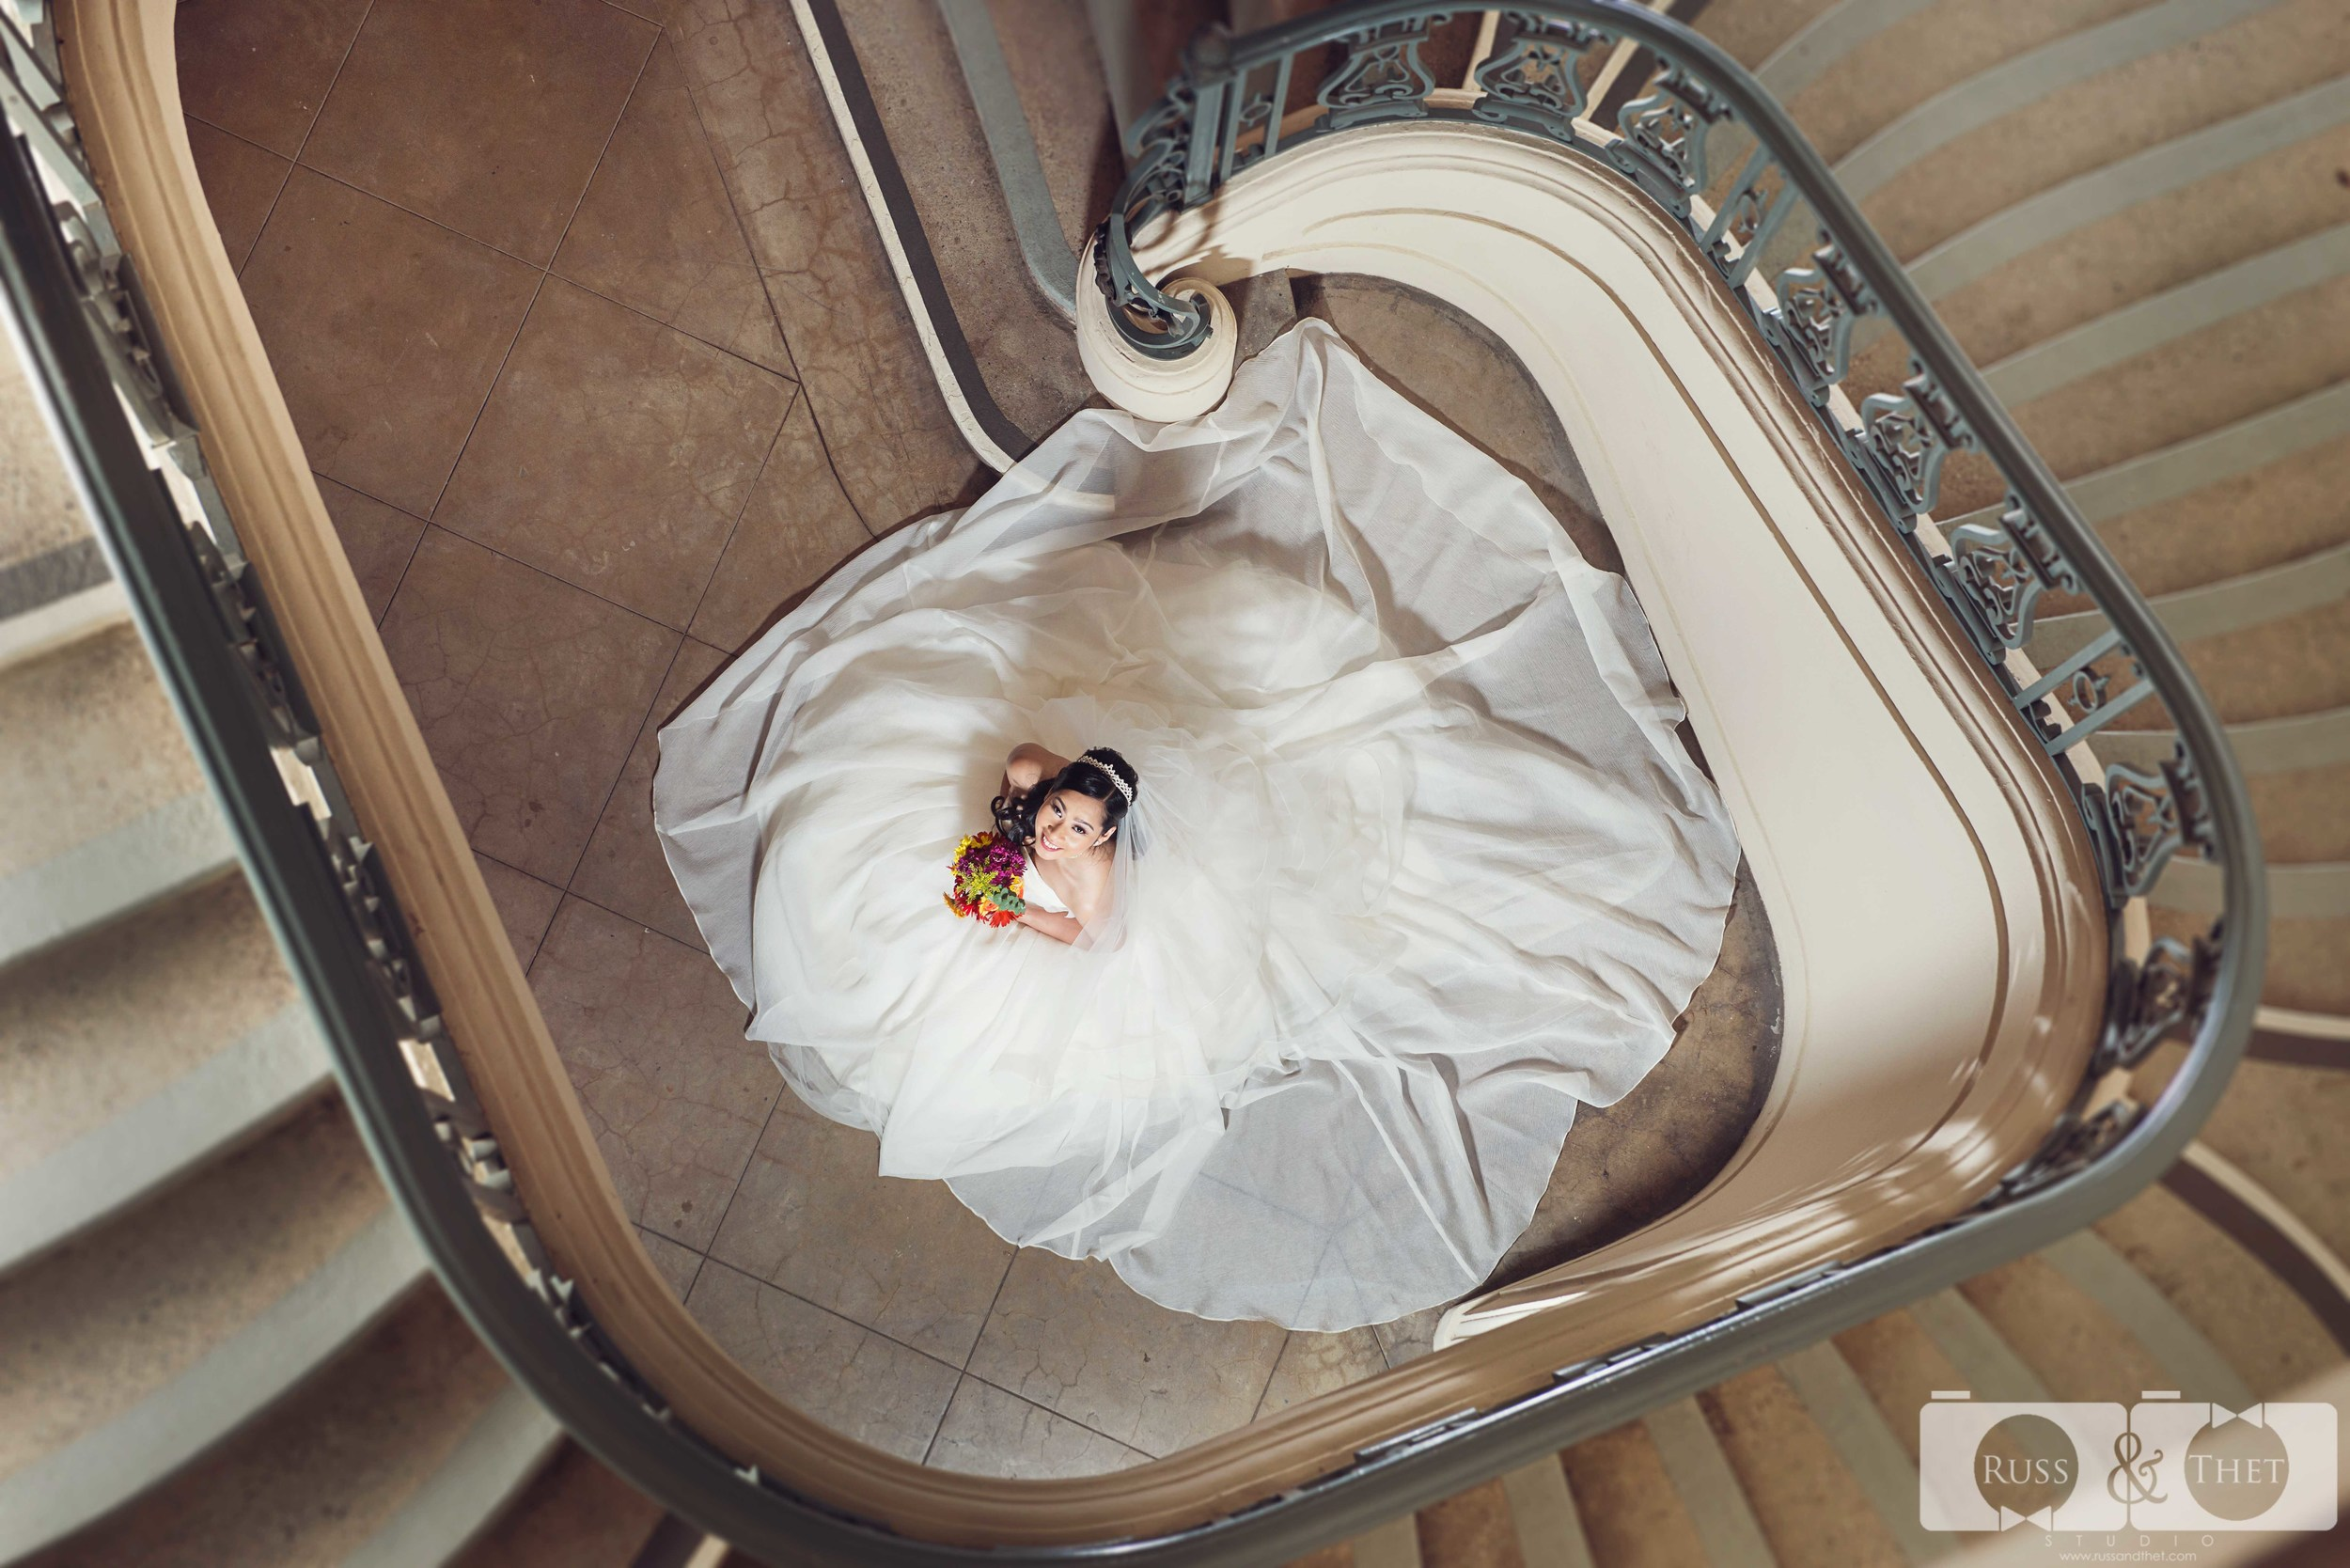 royal-palace-banquet-hall-glendale-wedding-83.JPG